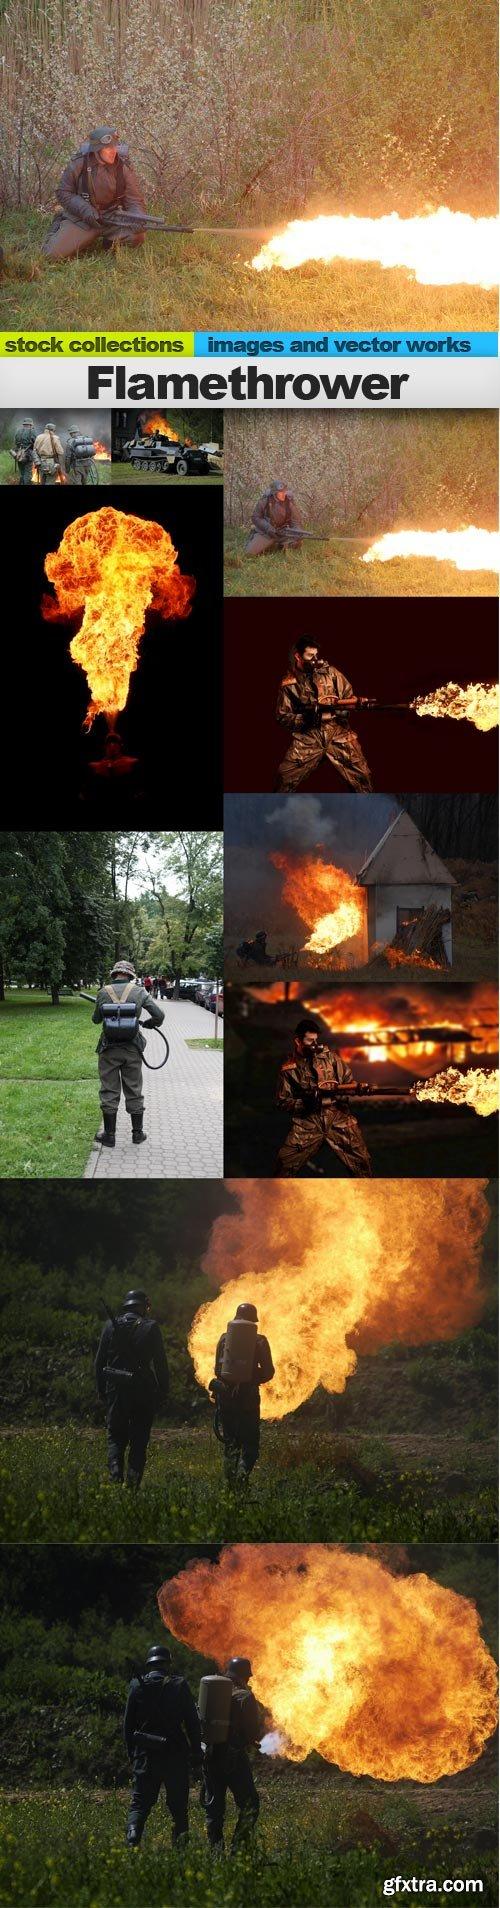 Flamethrower, 10 x UHQ JPEG